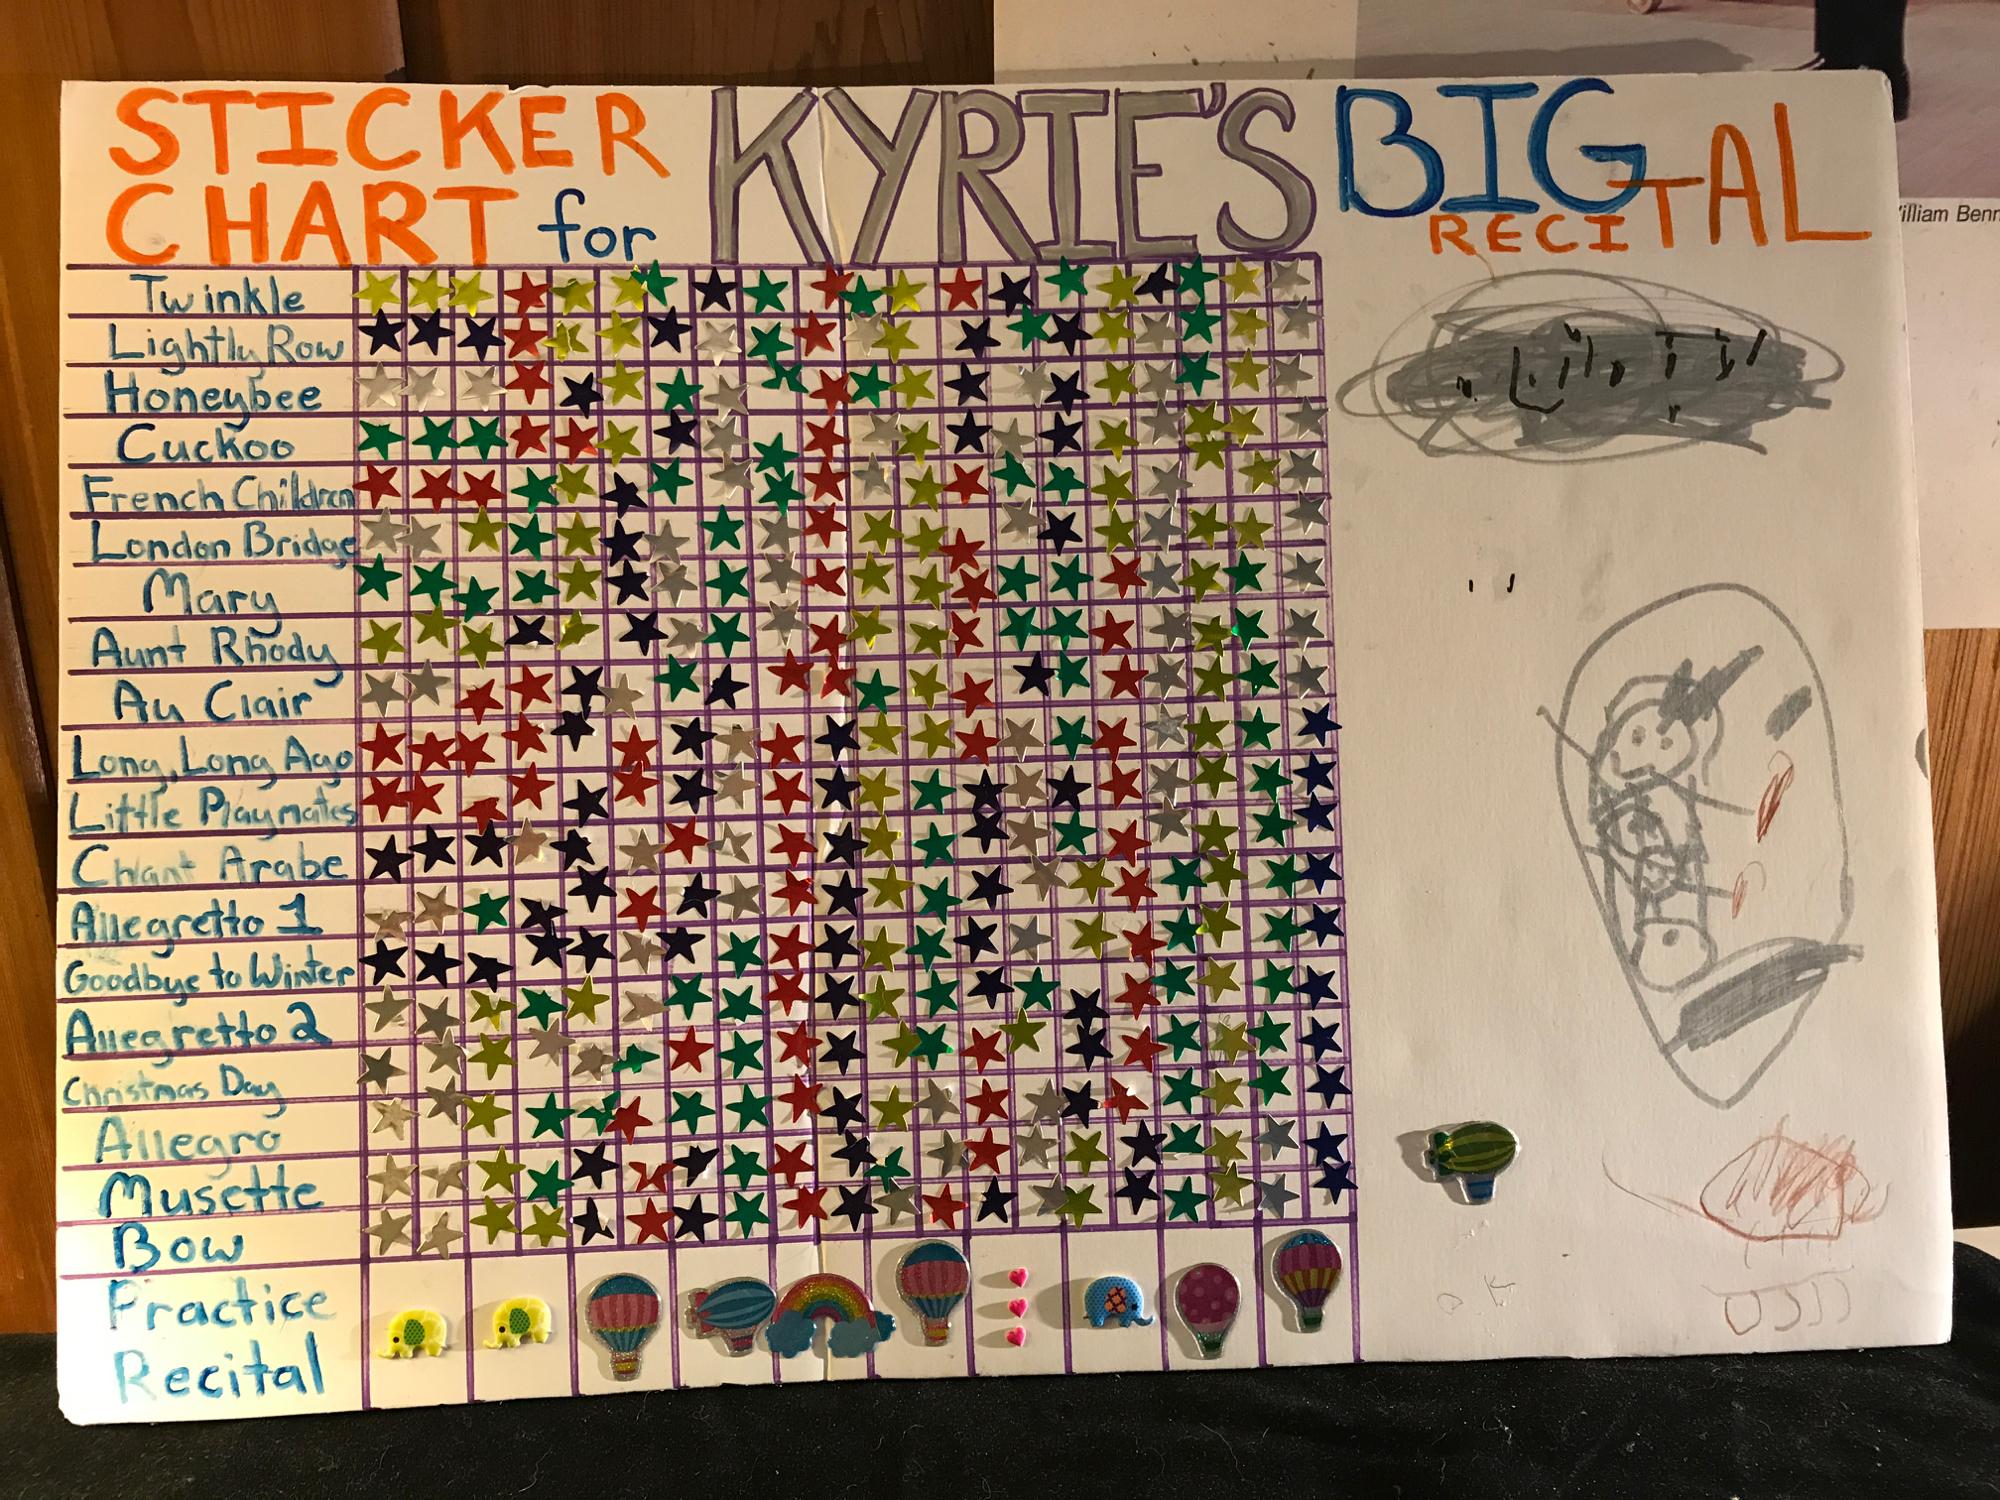 Kyrié's Big Chart